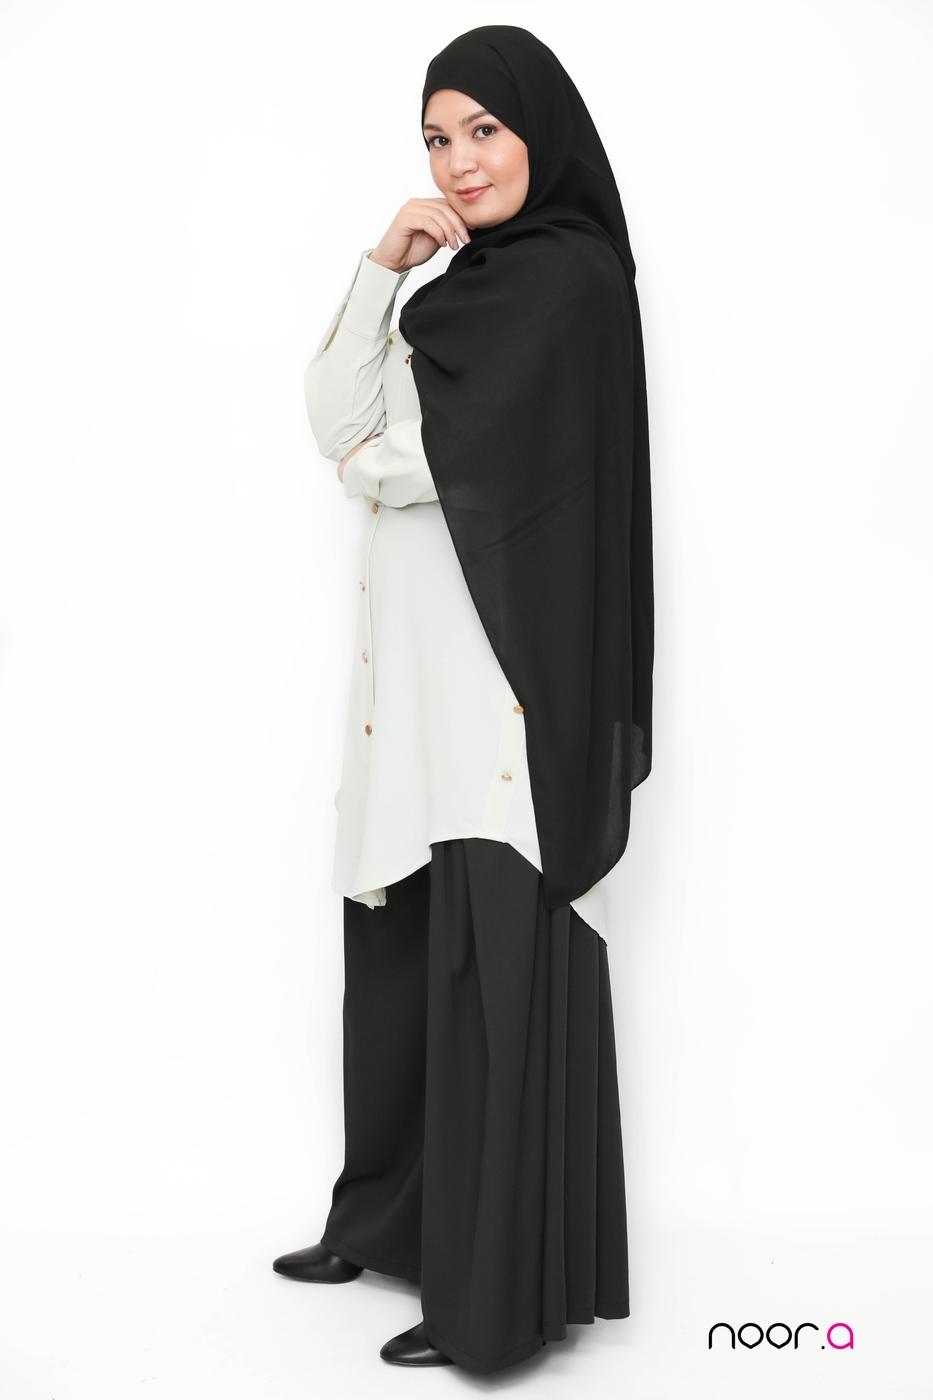 chemise-oversize-vert-amande-pantalon-large-noir-hijab-jazz-noir